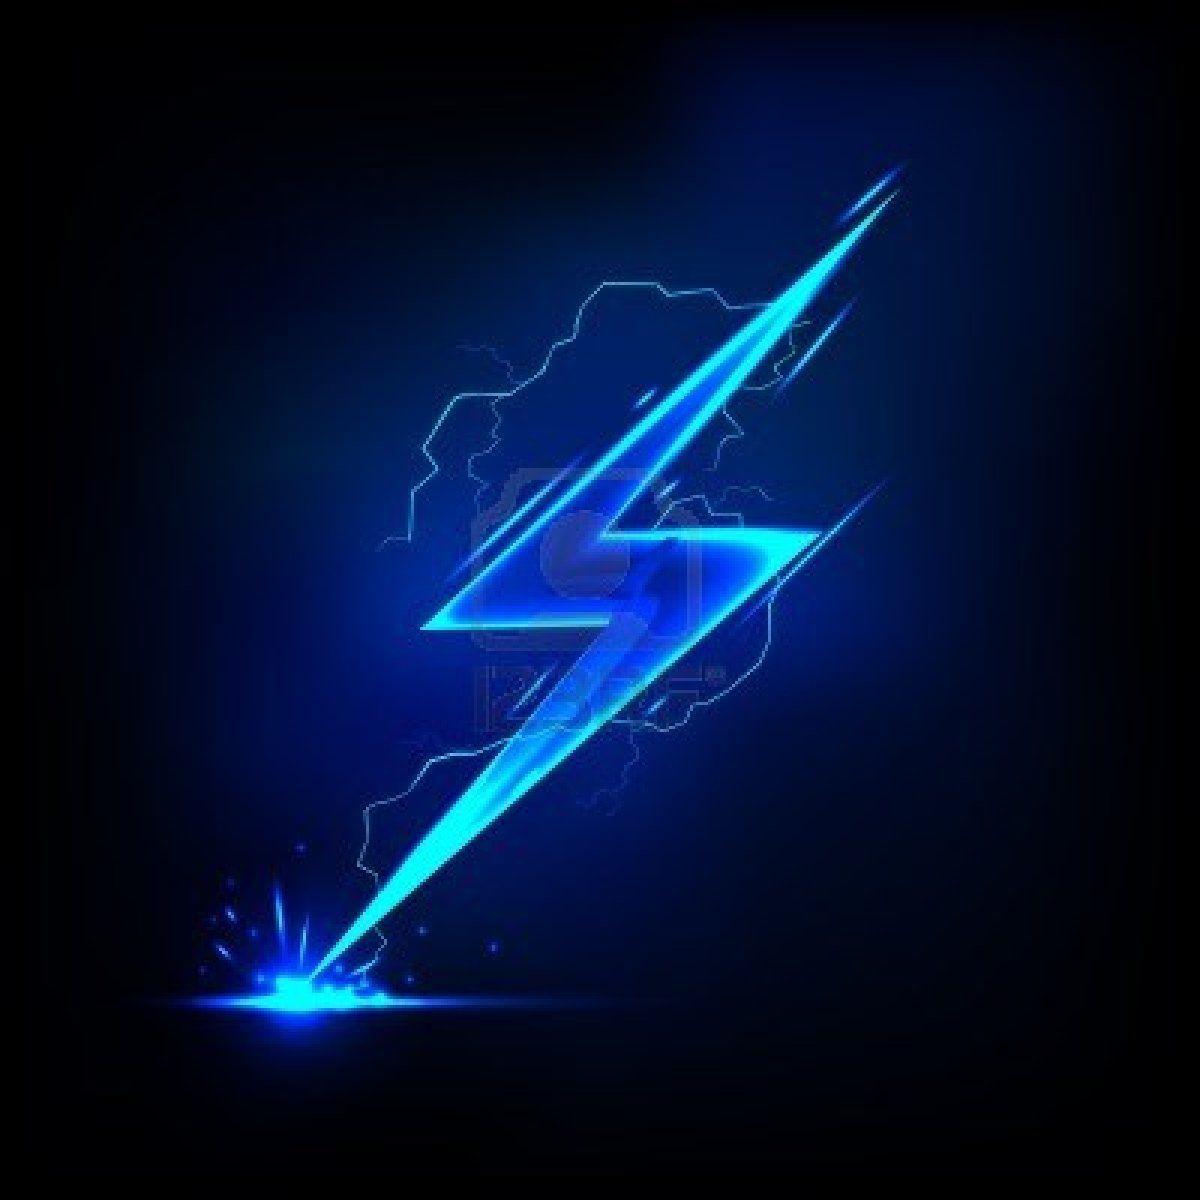 Free Download Blue Lightning Bolt Wallpaper Lightning Bolt